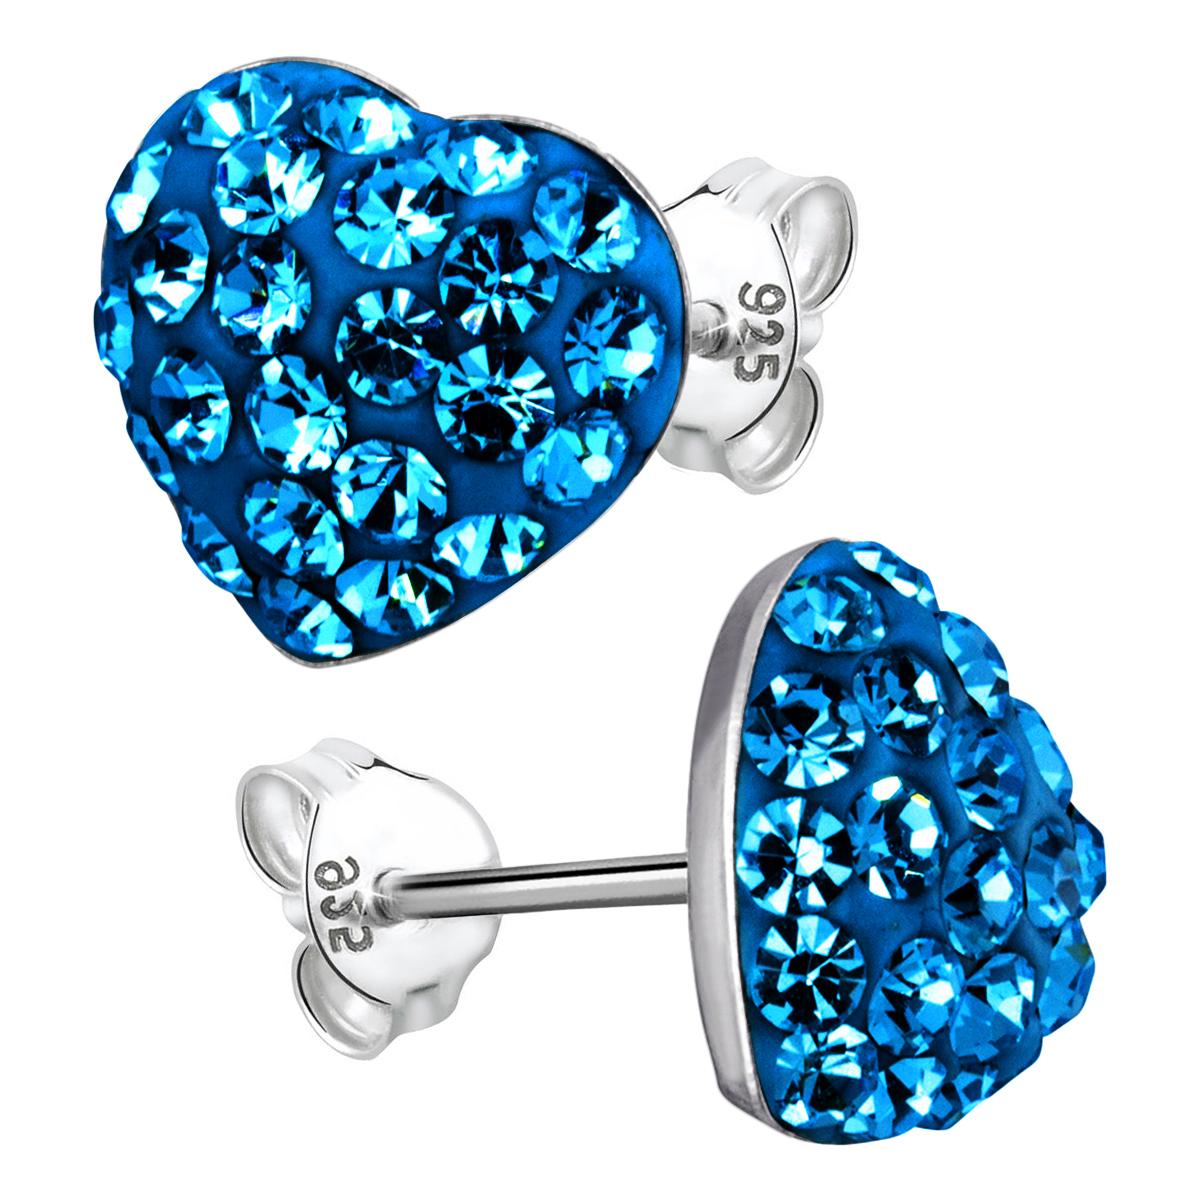 MATERIA Ohrstecker Herz blau Kristall - 925 Silber Ohrringe 9mm